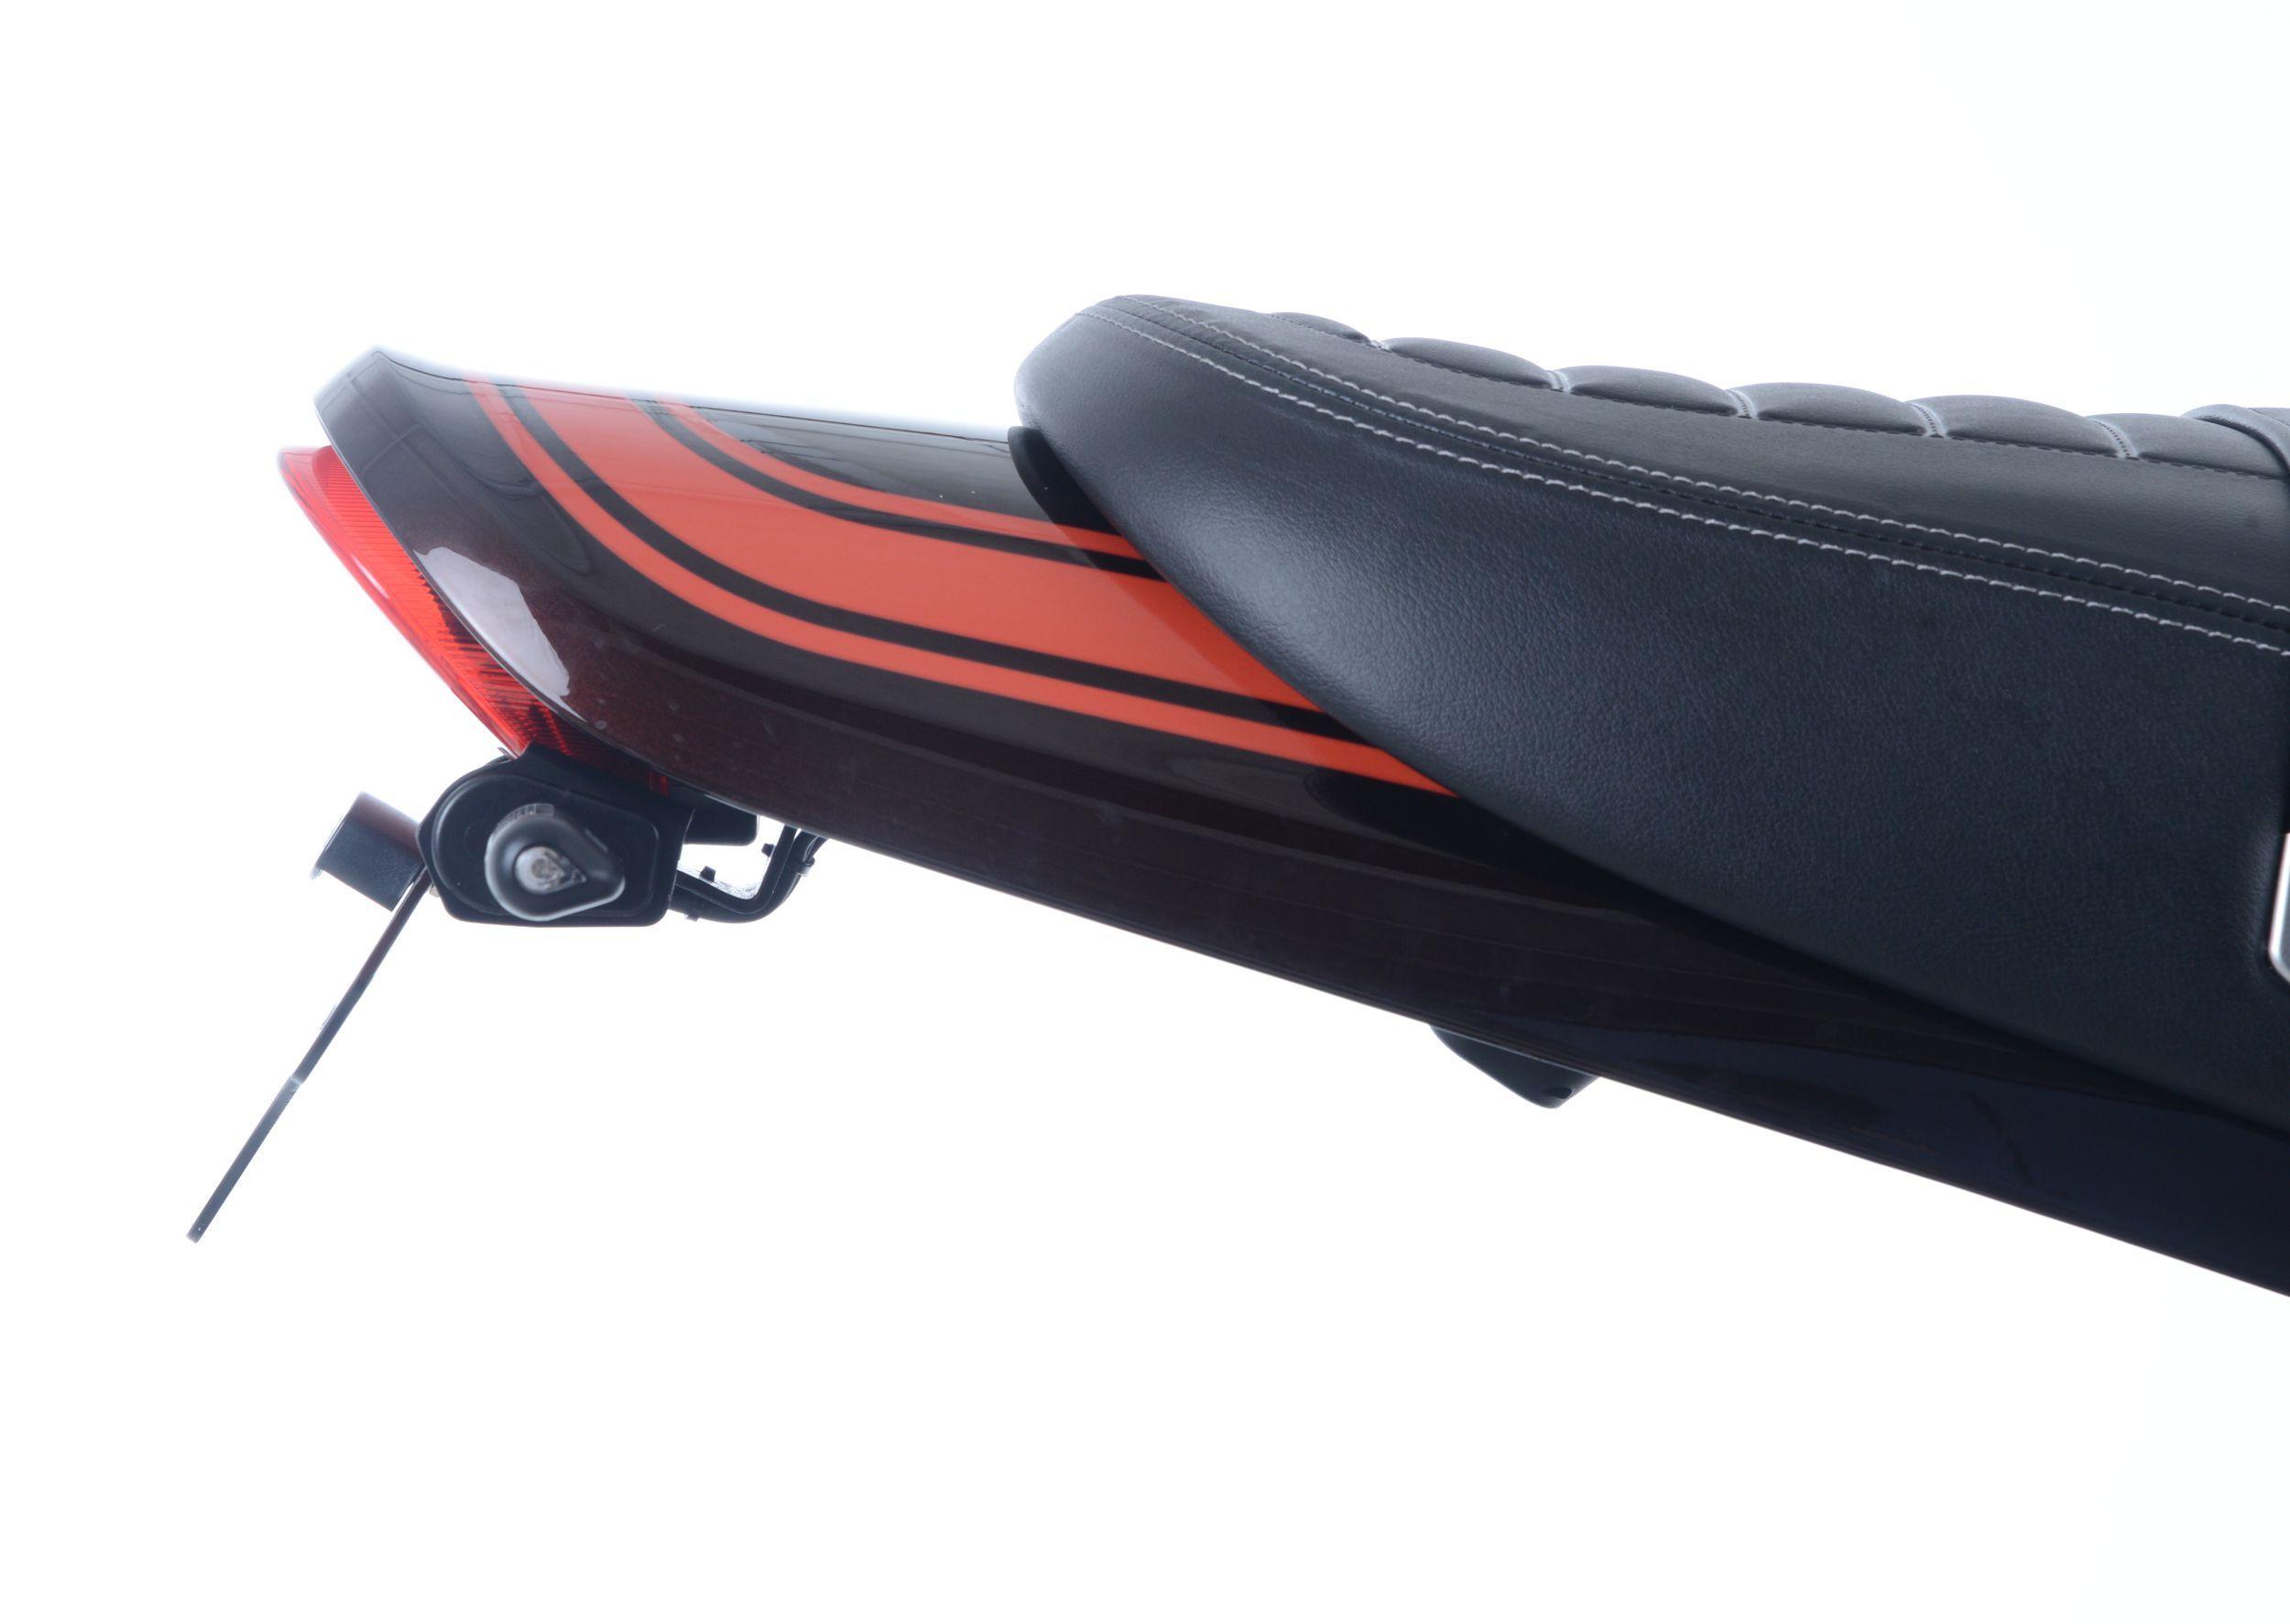 BODYSTYLE Sitzkeil mit ABE - unlackiert - Honda CB 650 F